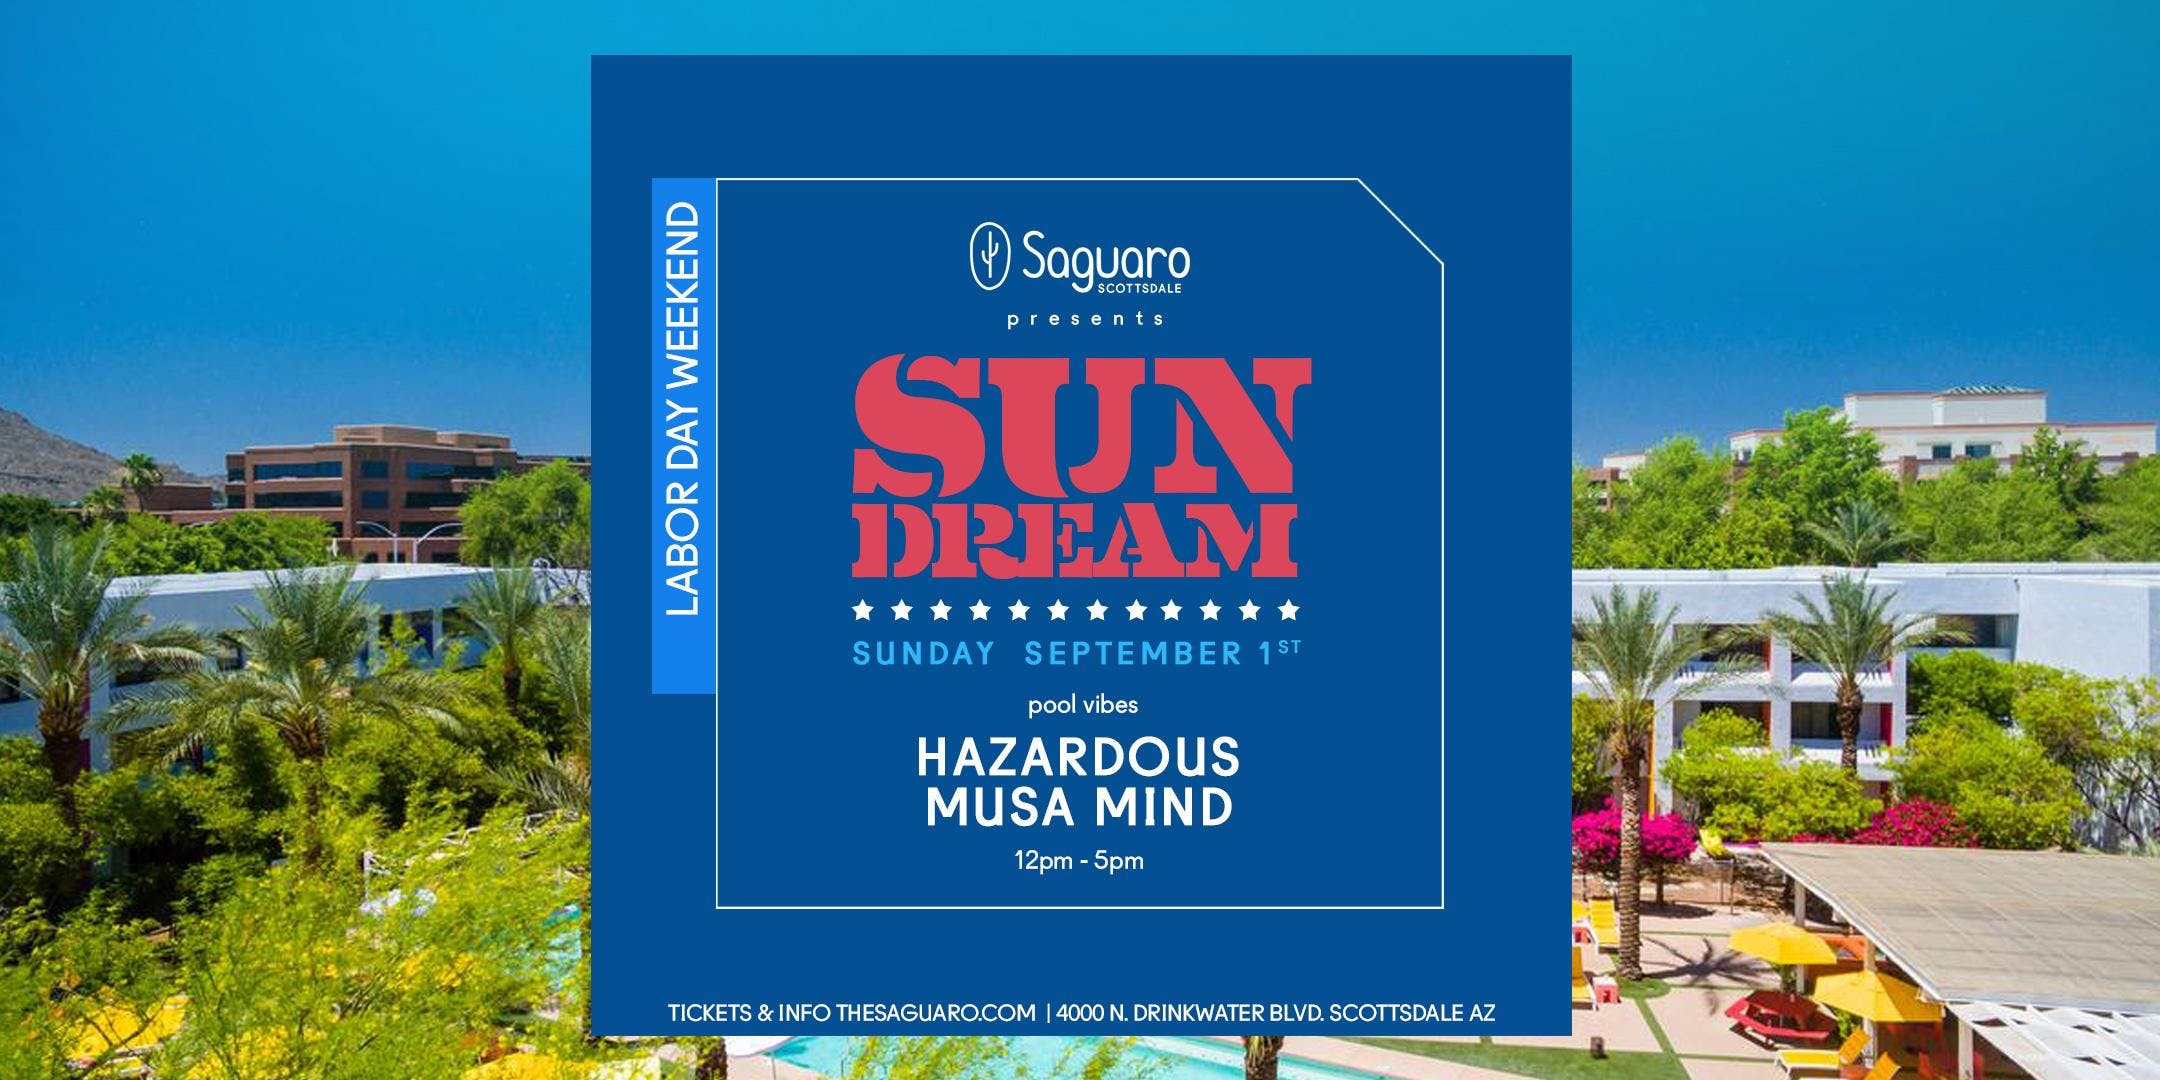 The Saguaro Scottsdale presents